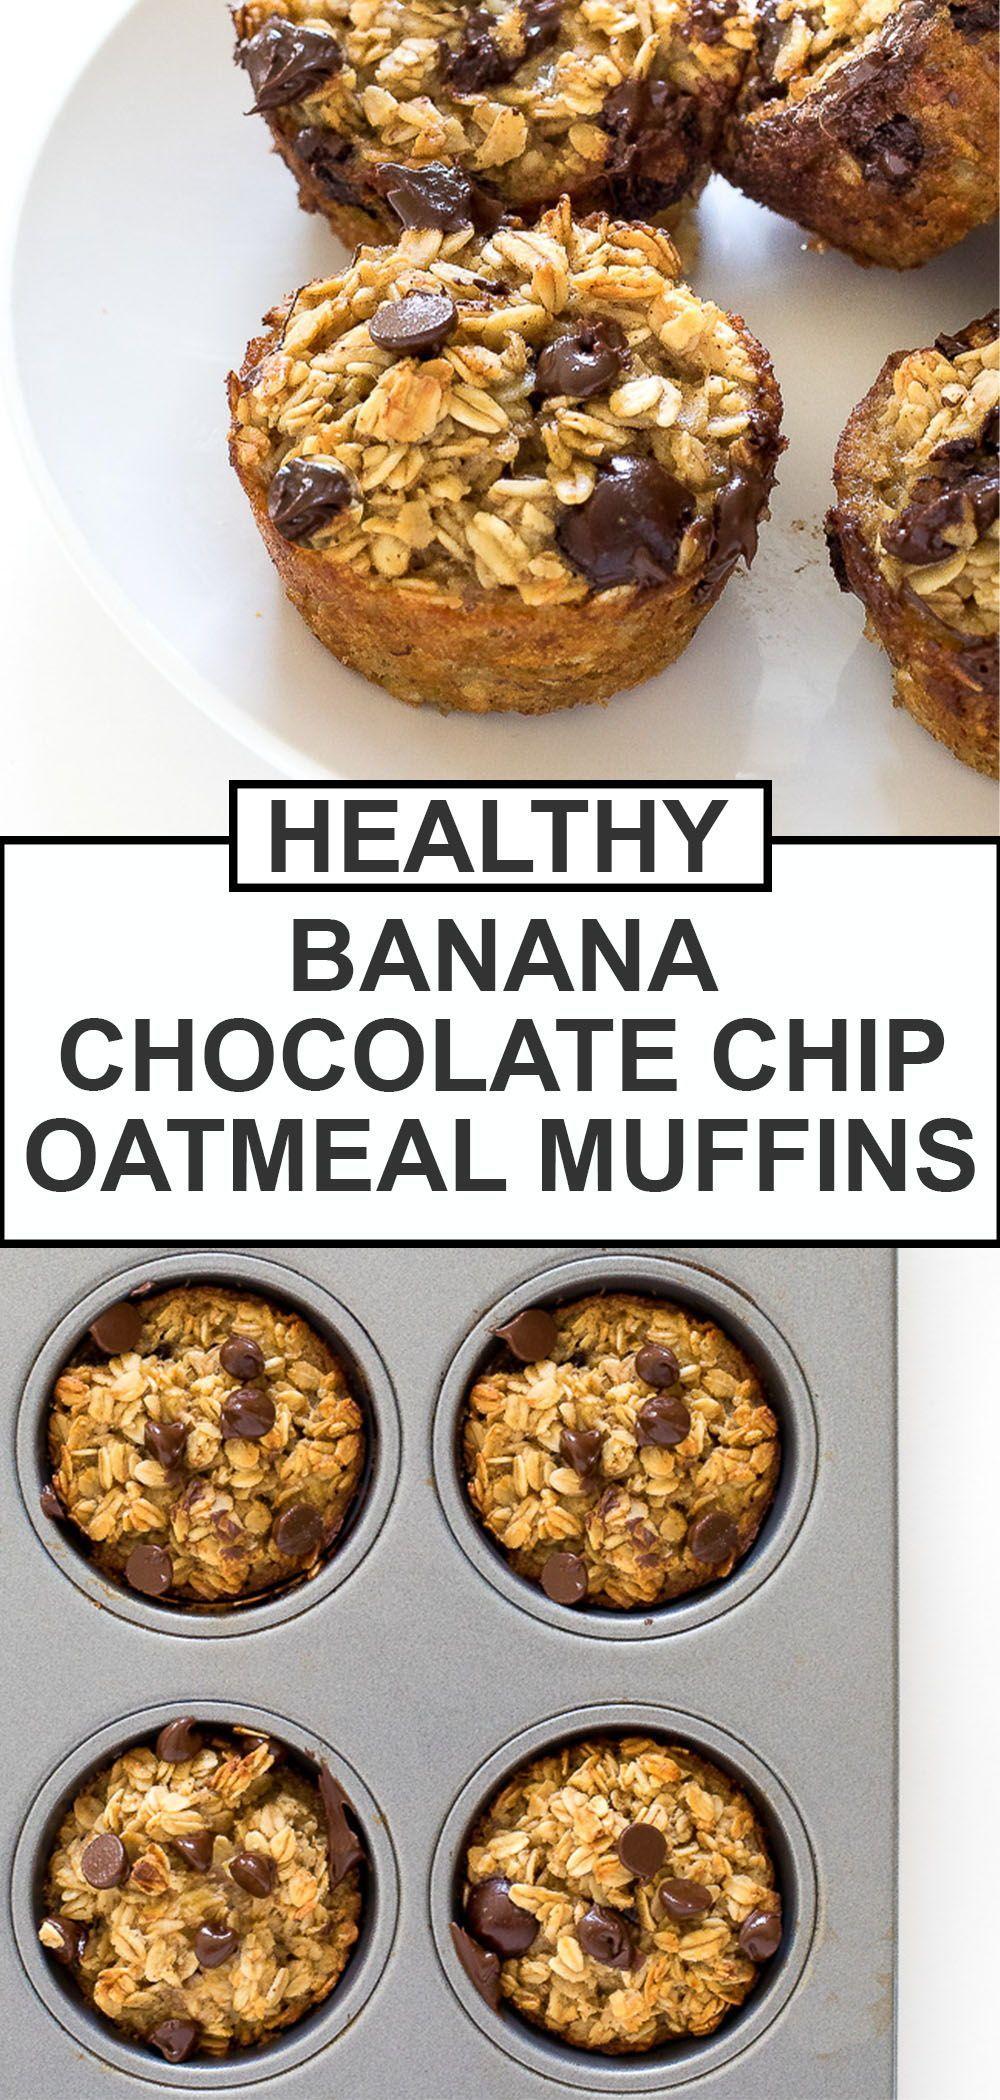 Healthy Banana Chocolate Chip Oatmeal Muffins Chef Savvy Recipe In 2021 Oatmeal Chocolate Chip Muffins Banana Oatmeal Chocolate Chip Muffins Healthy Chocolate Chip Muffins